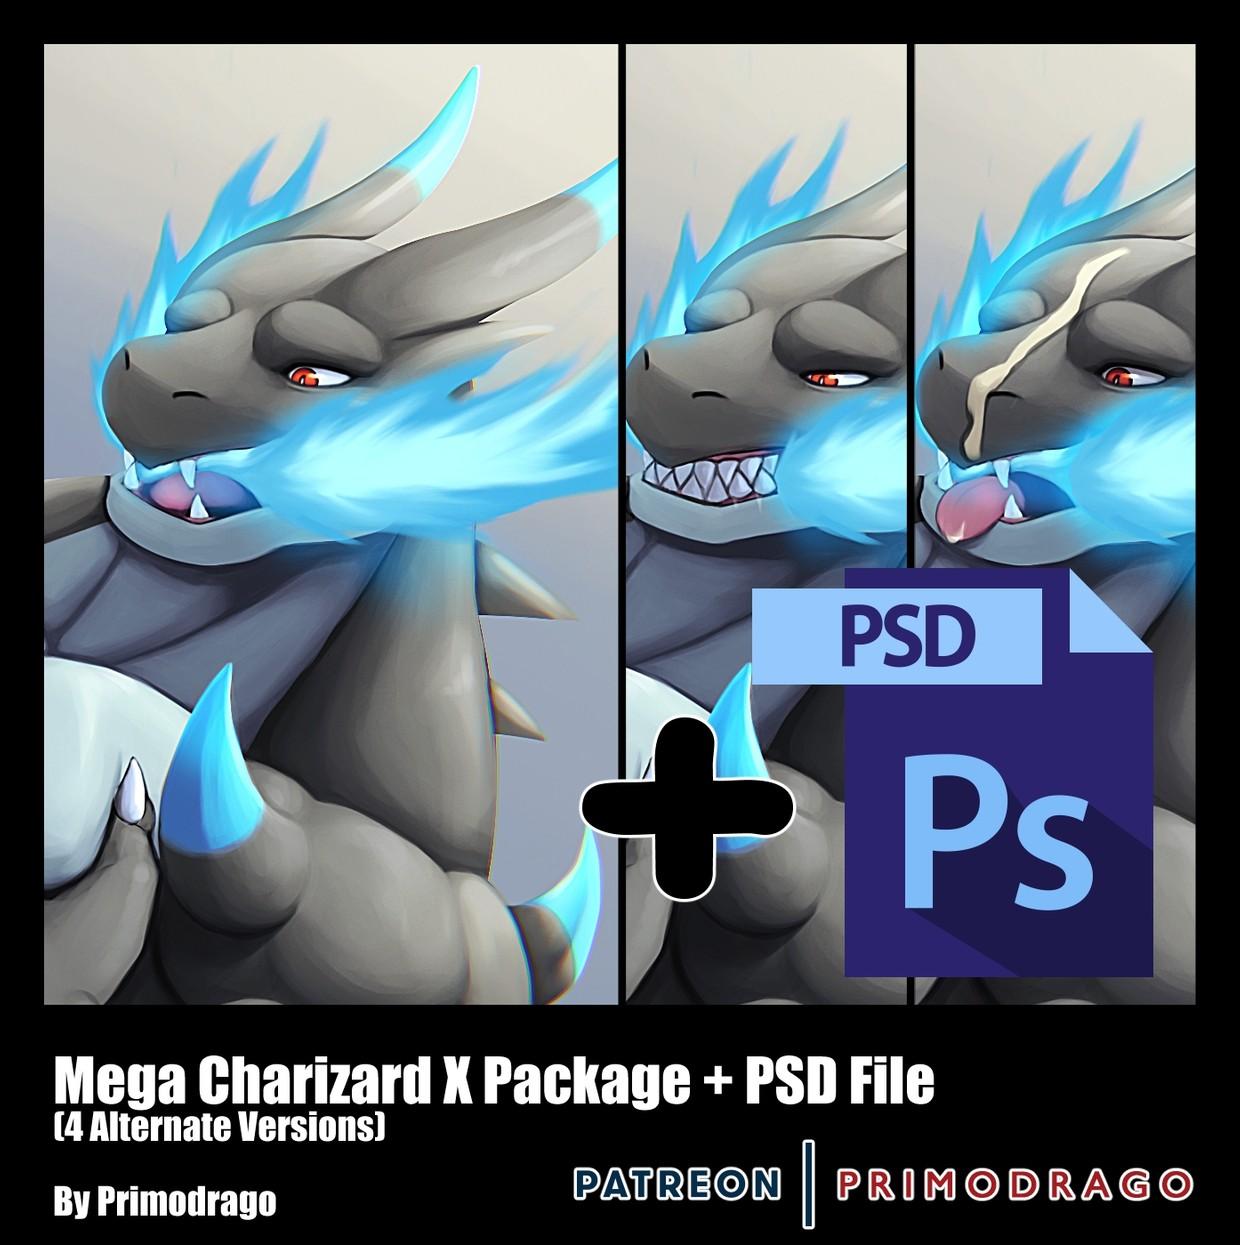 Mega Charizard X Artpack + PSD File